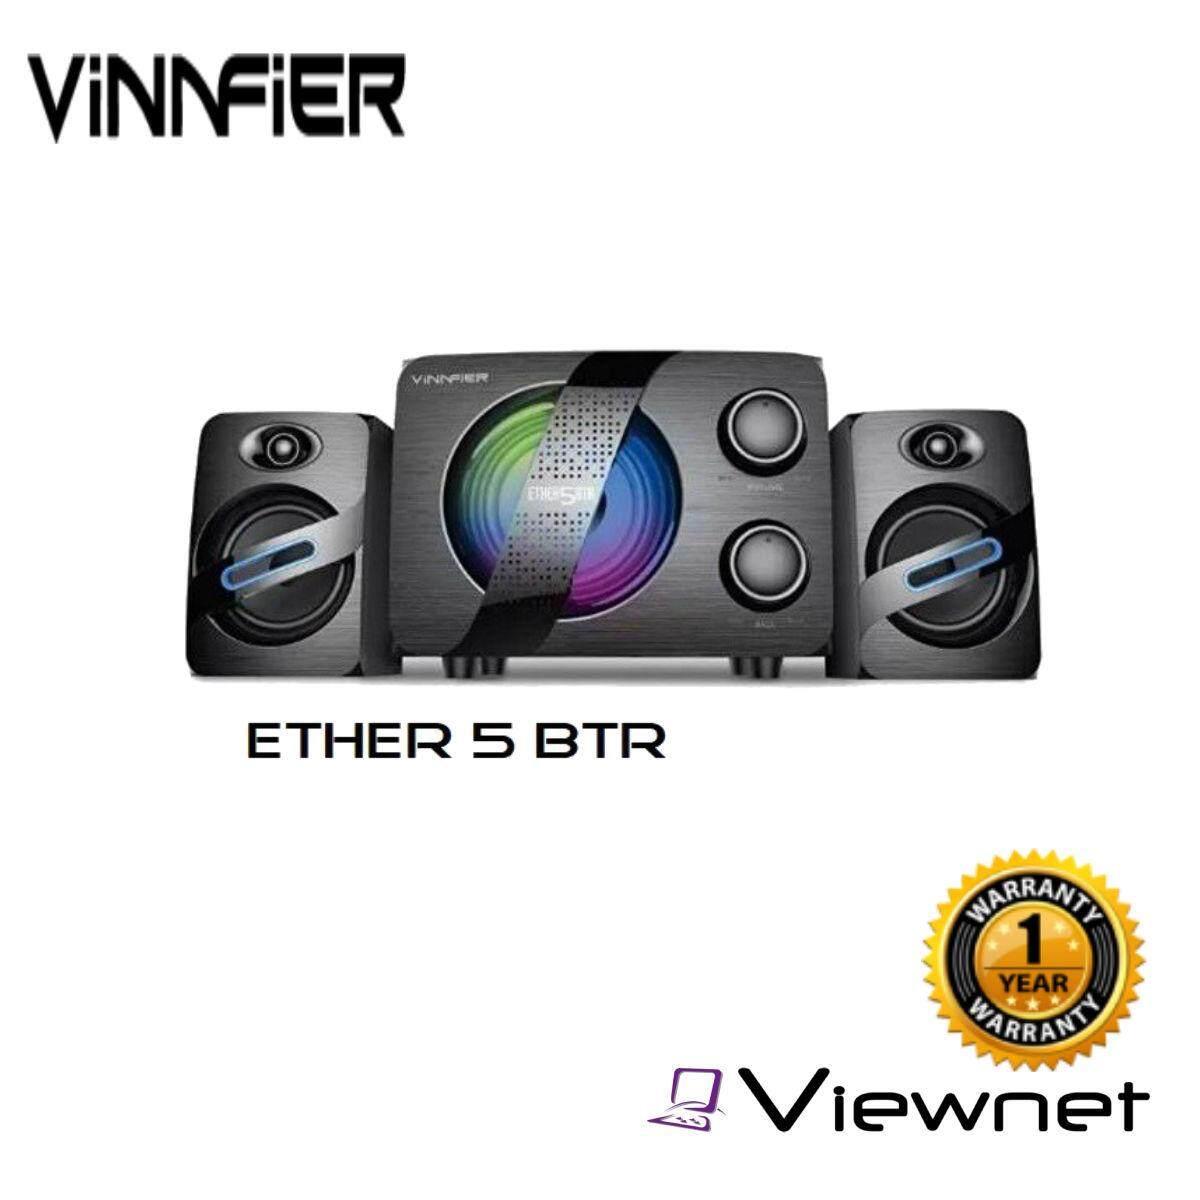 Vinnfier Ether 5 BTR 34W RMS 2.1 Multimedia Bluetooth Speaker USB FM USB/SD slot and Karaoke function